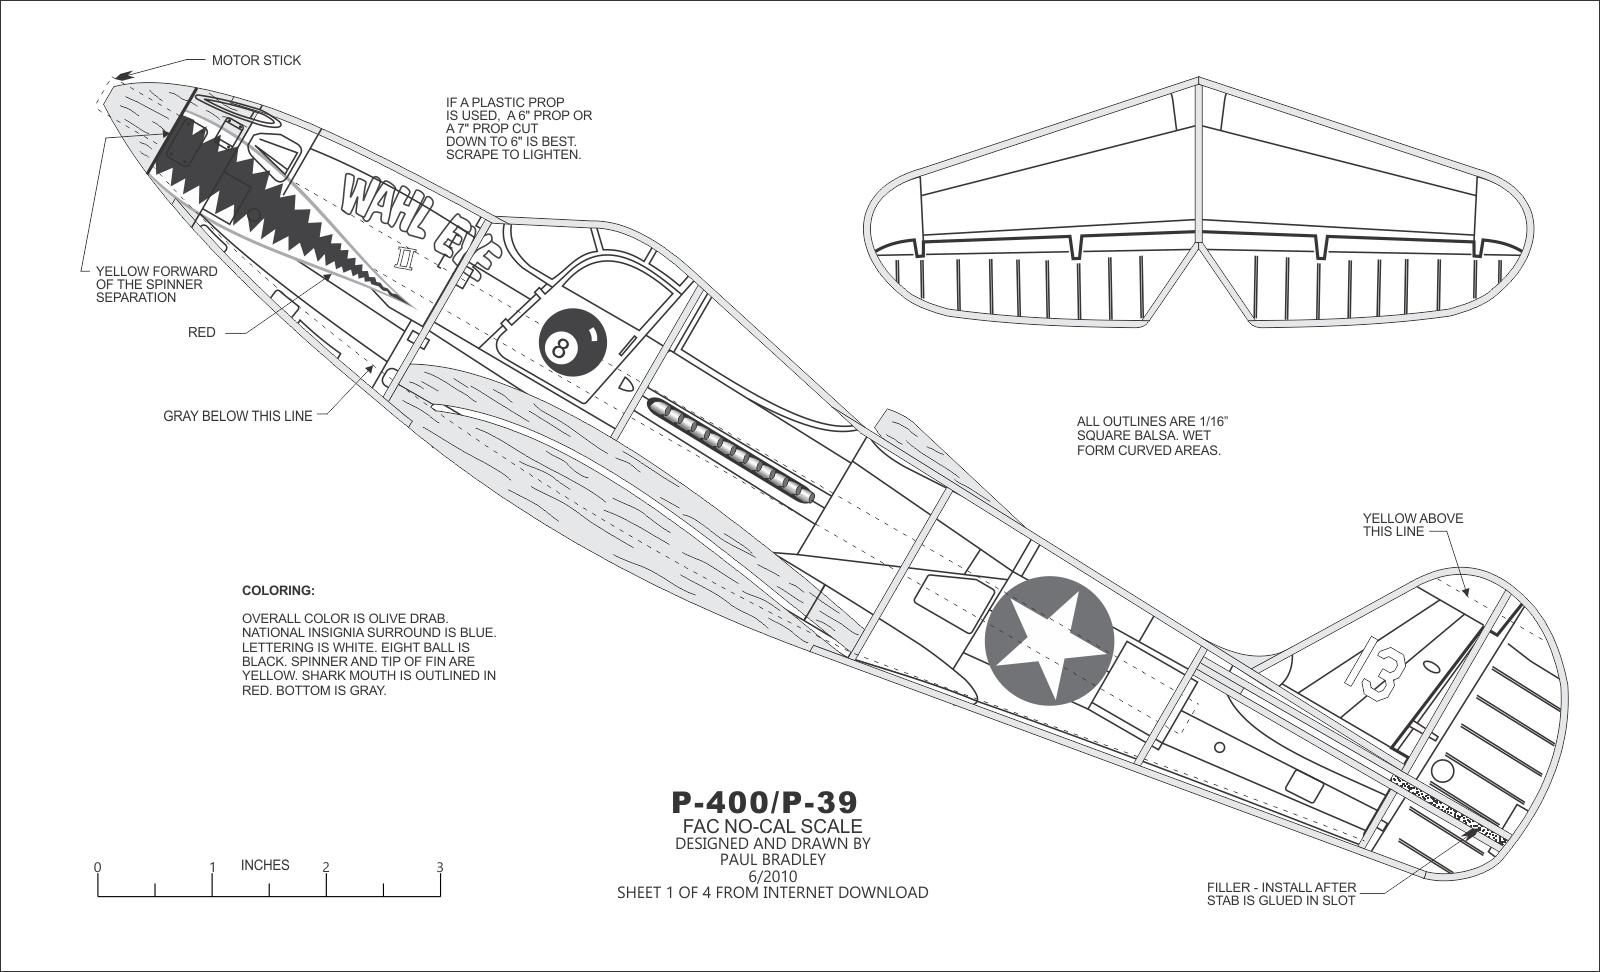 https://0201.nccdn.net/1_2/000/000/196/448/P-39-No-Cal-fuselage-1600x972.jpg